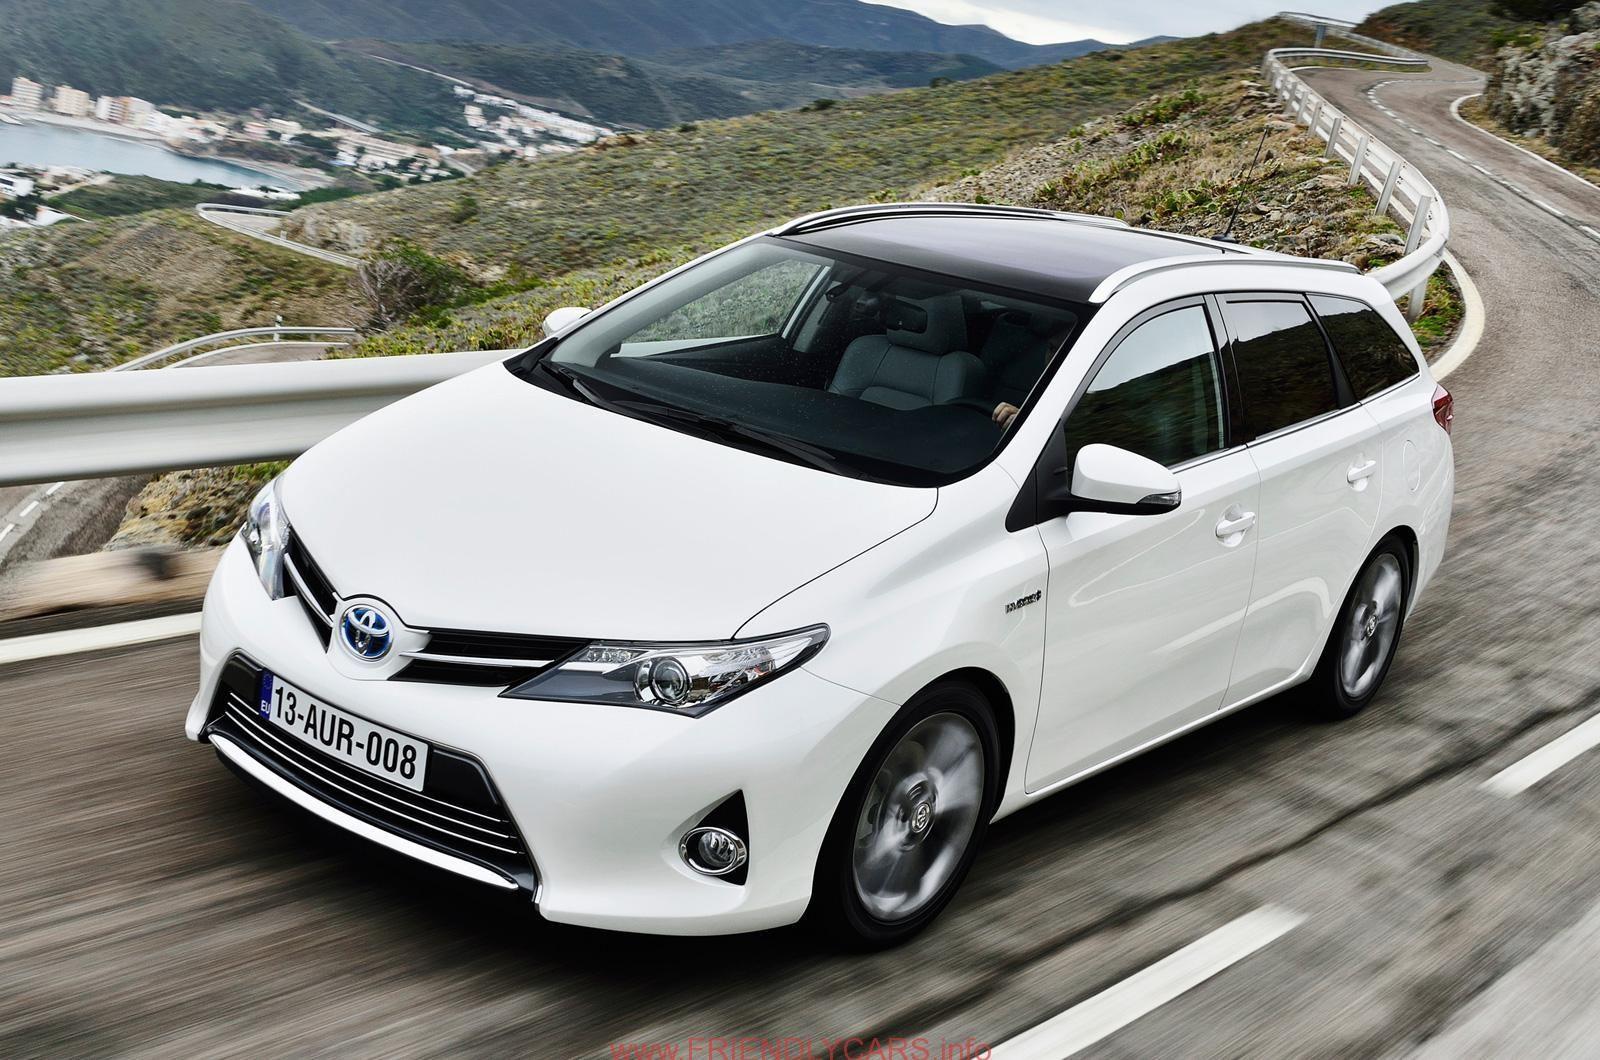 2014 Toyota Supra exotic sports car concept - Auto Daily News  Toyota Sport Cars 2014